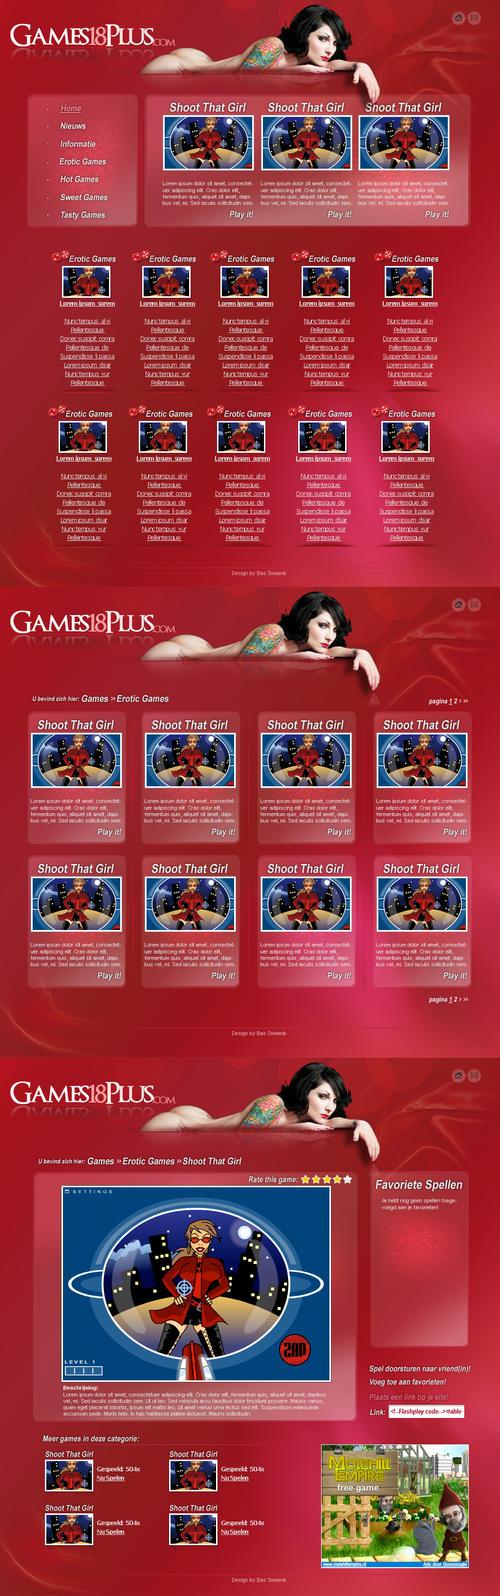 adult games website